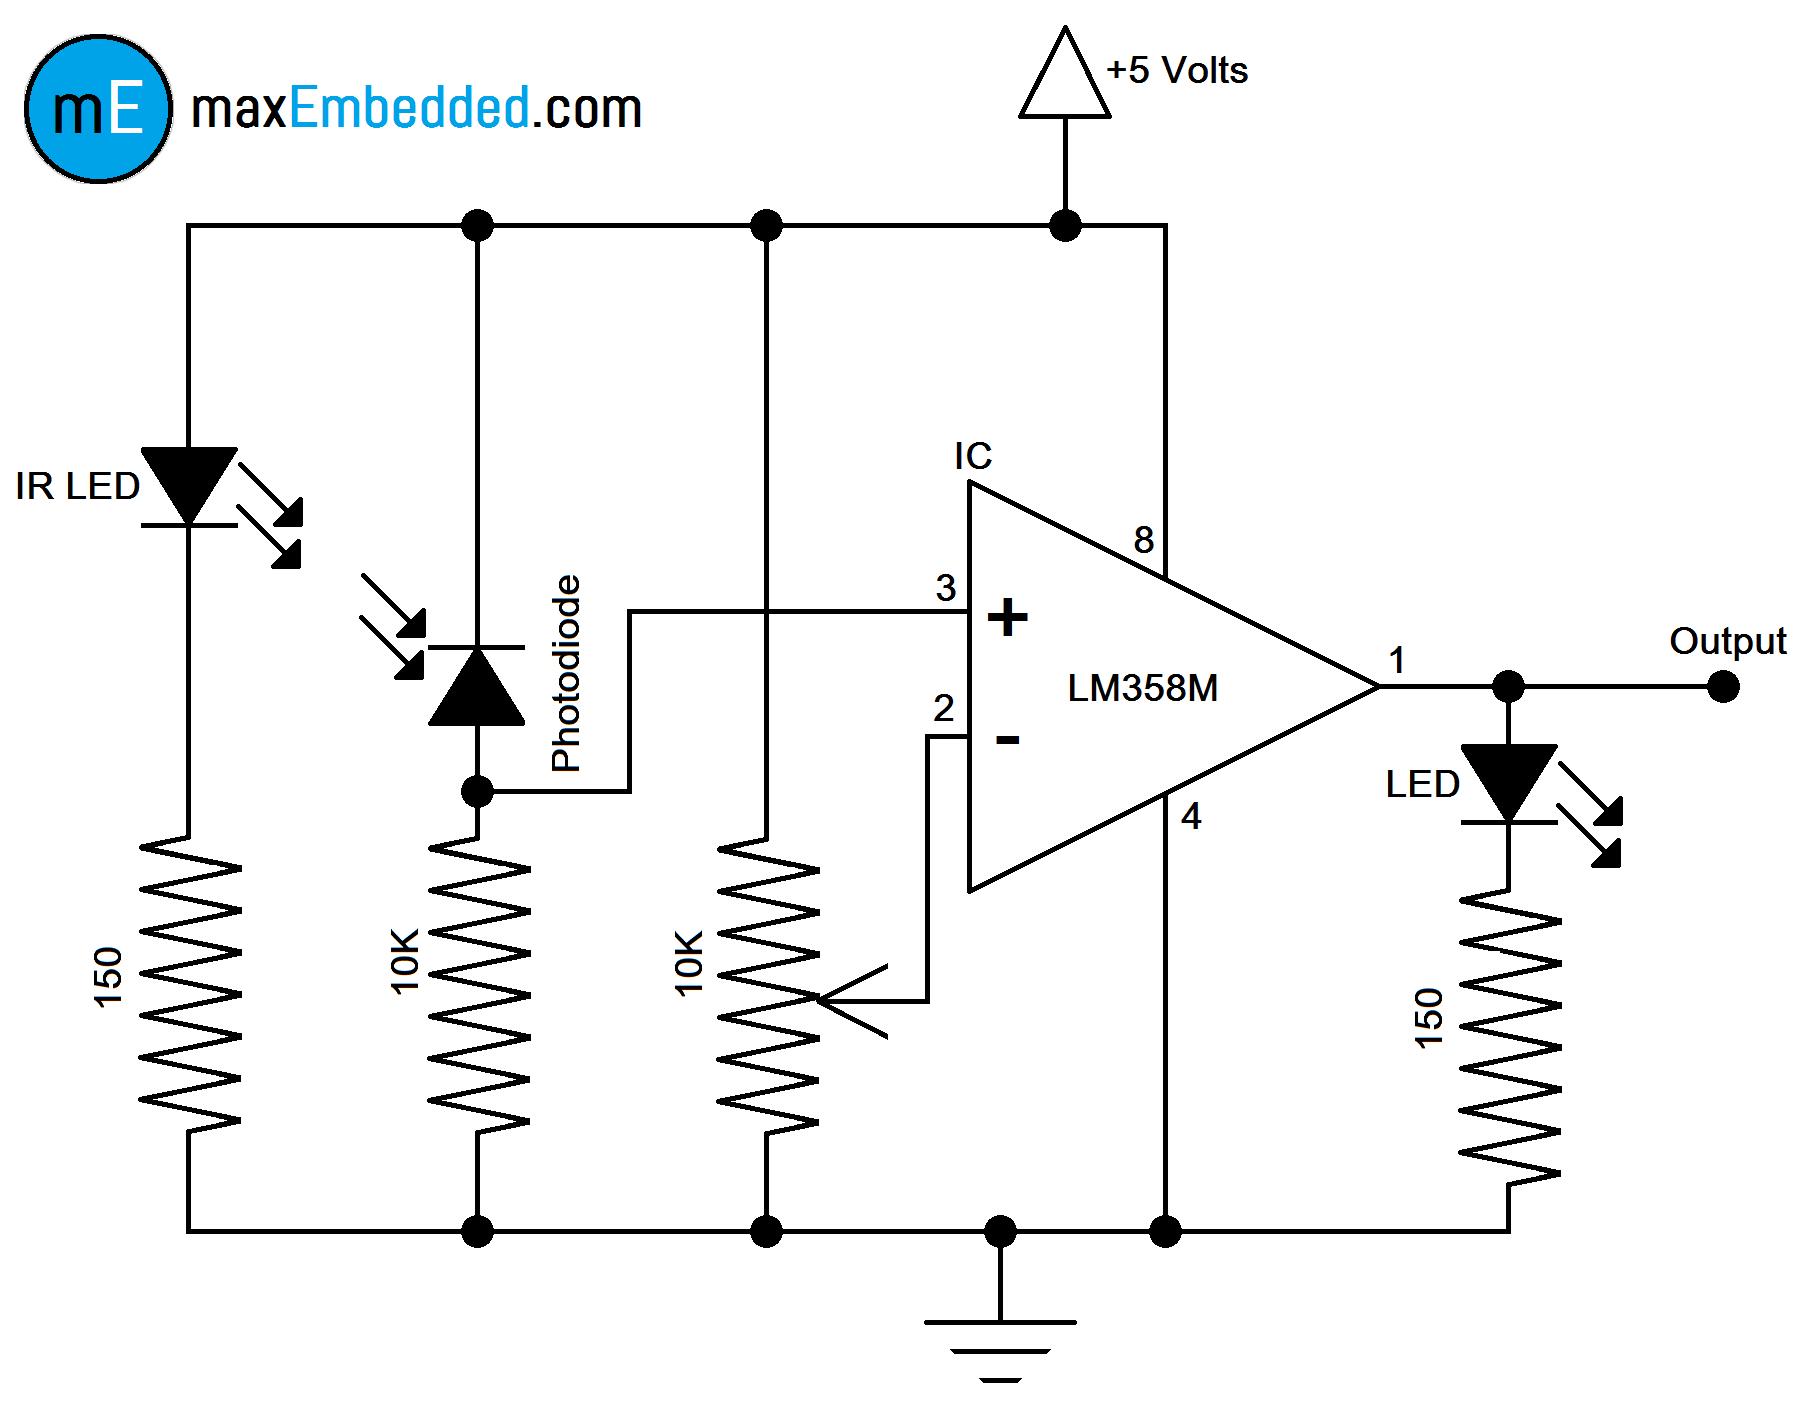 circuit diagram new?resize\\\=611%2C475 speakercraft ir receiver wiring diagram \u2022 indy500 co speakercraft ir receiver wiring diagram at nearapp.co